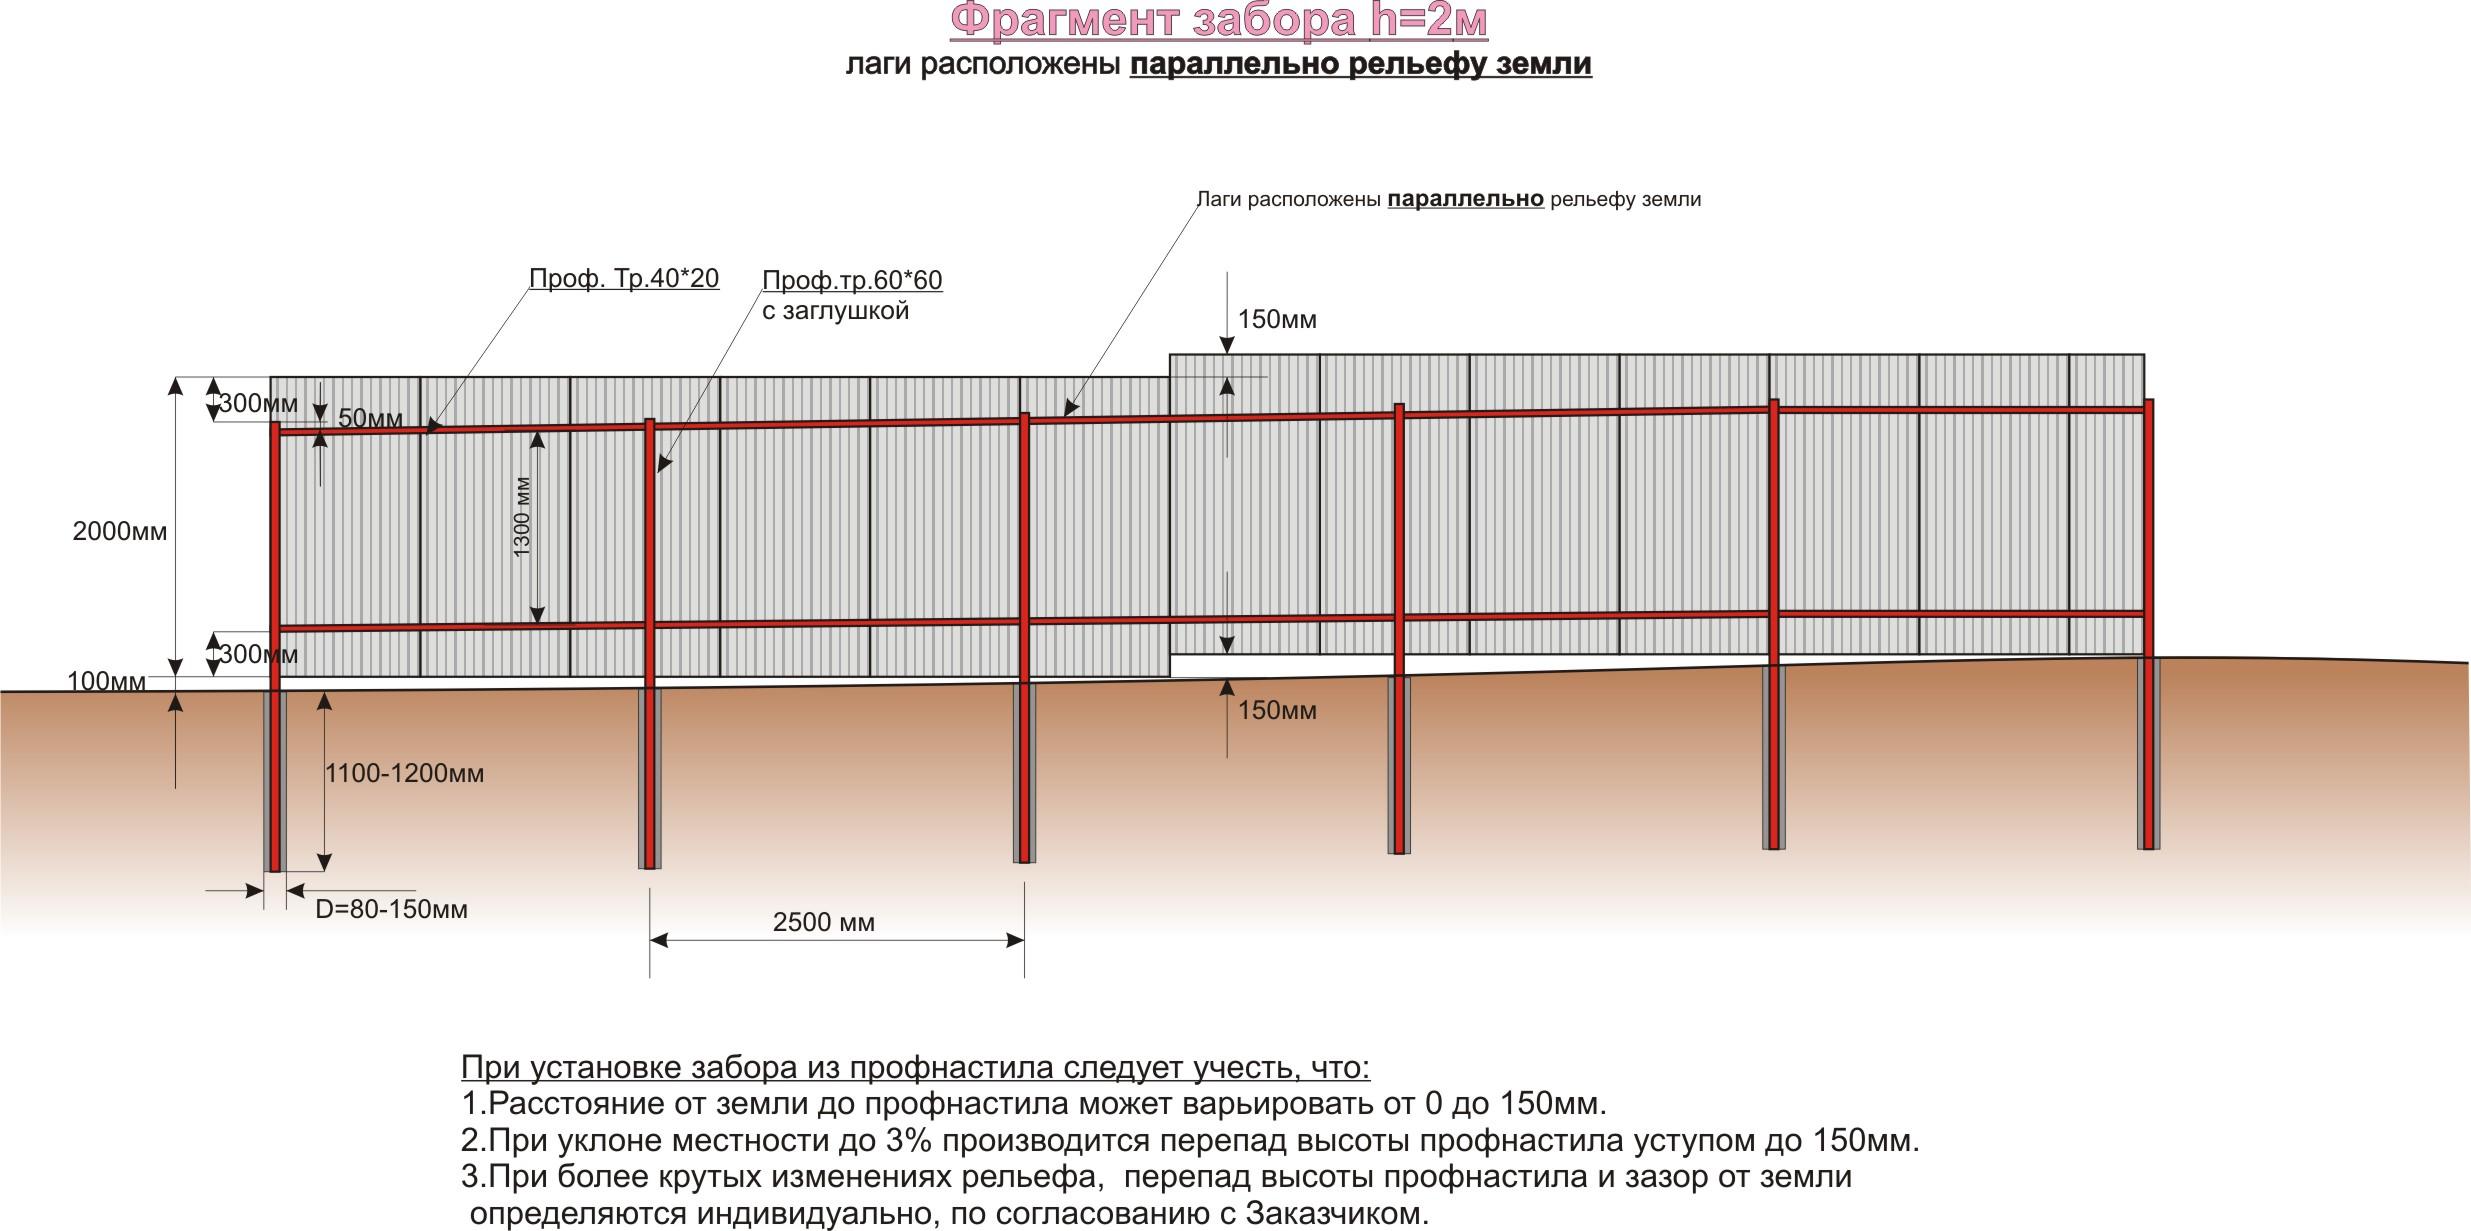 Схема расчета установки забора из профнастила